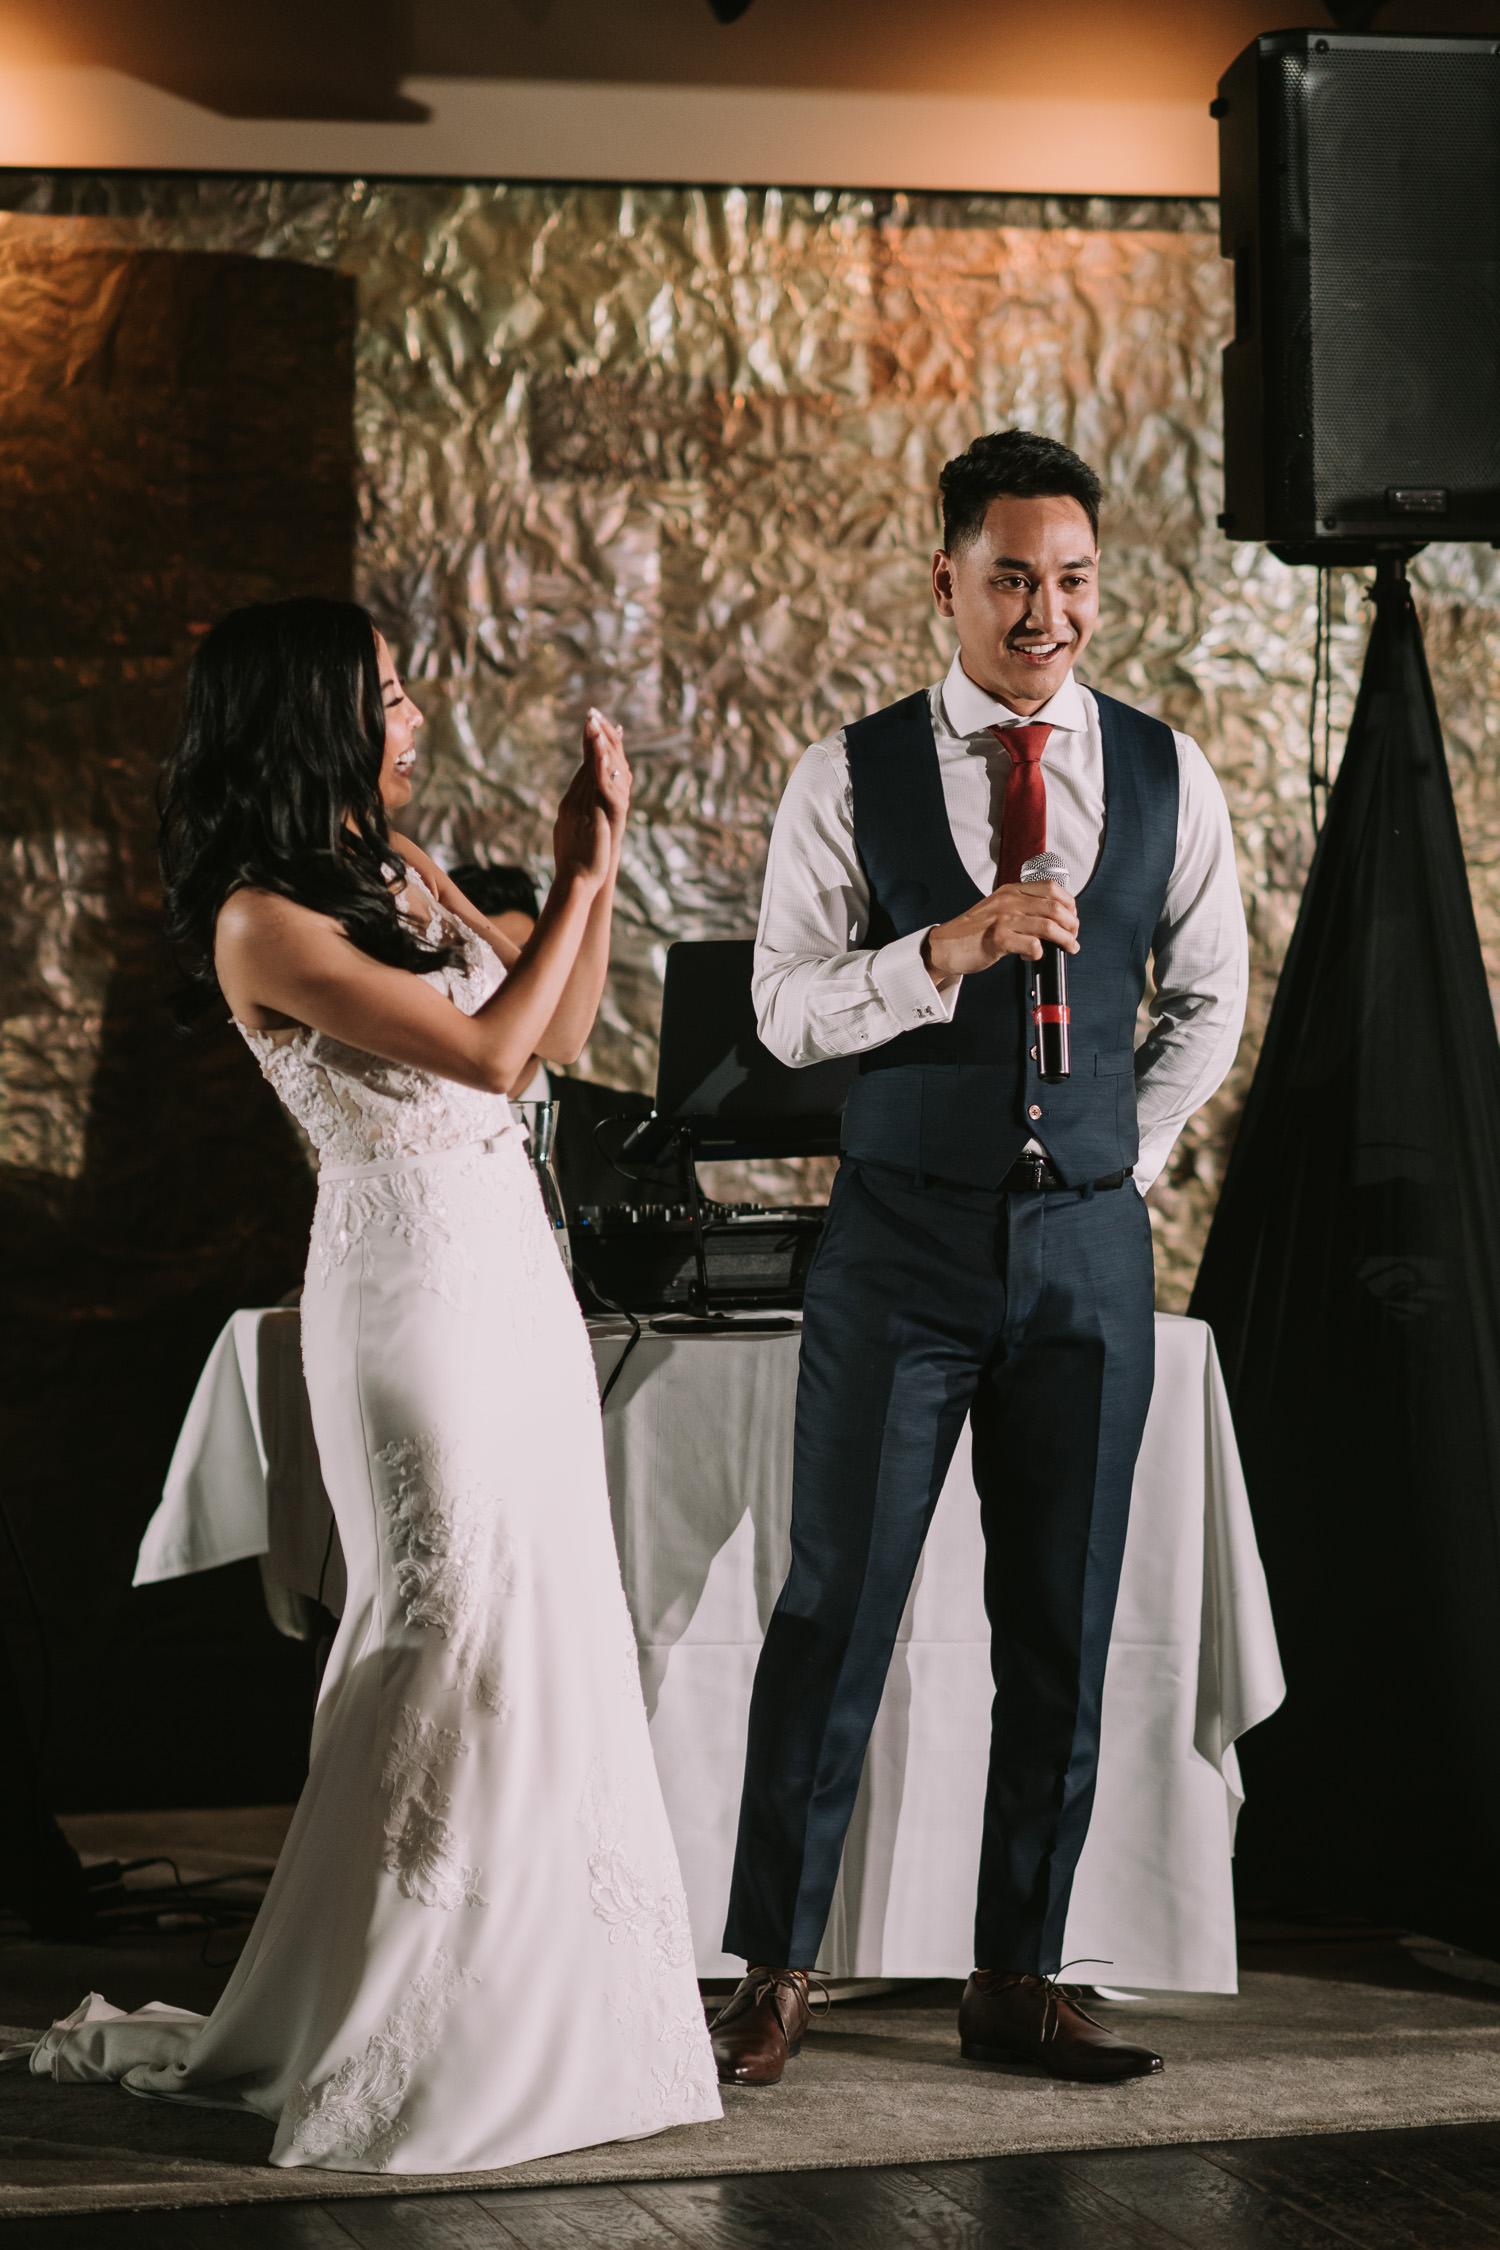 Canoe Restaurant Wedding Reception Bride and Groom Speech